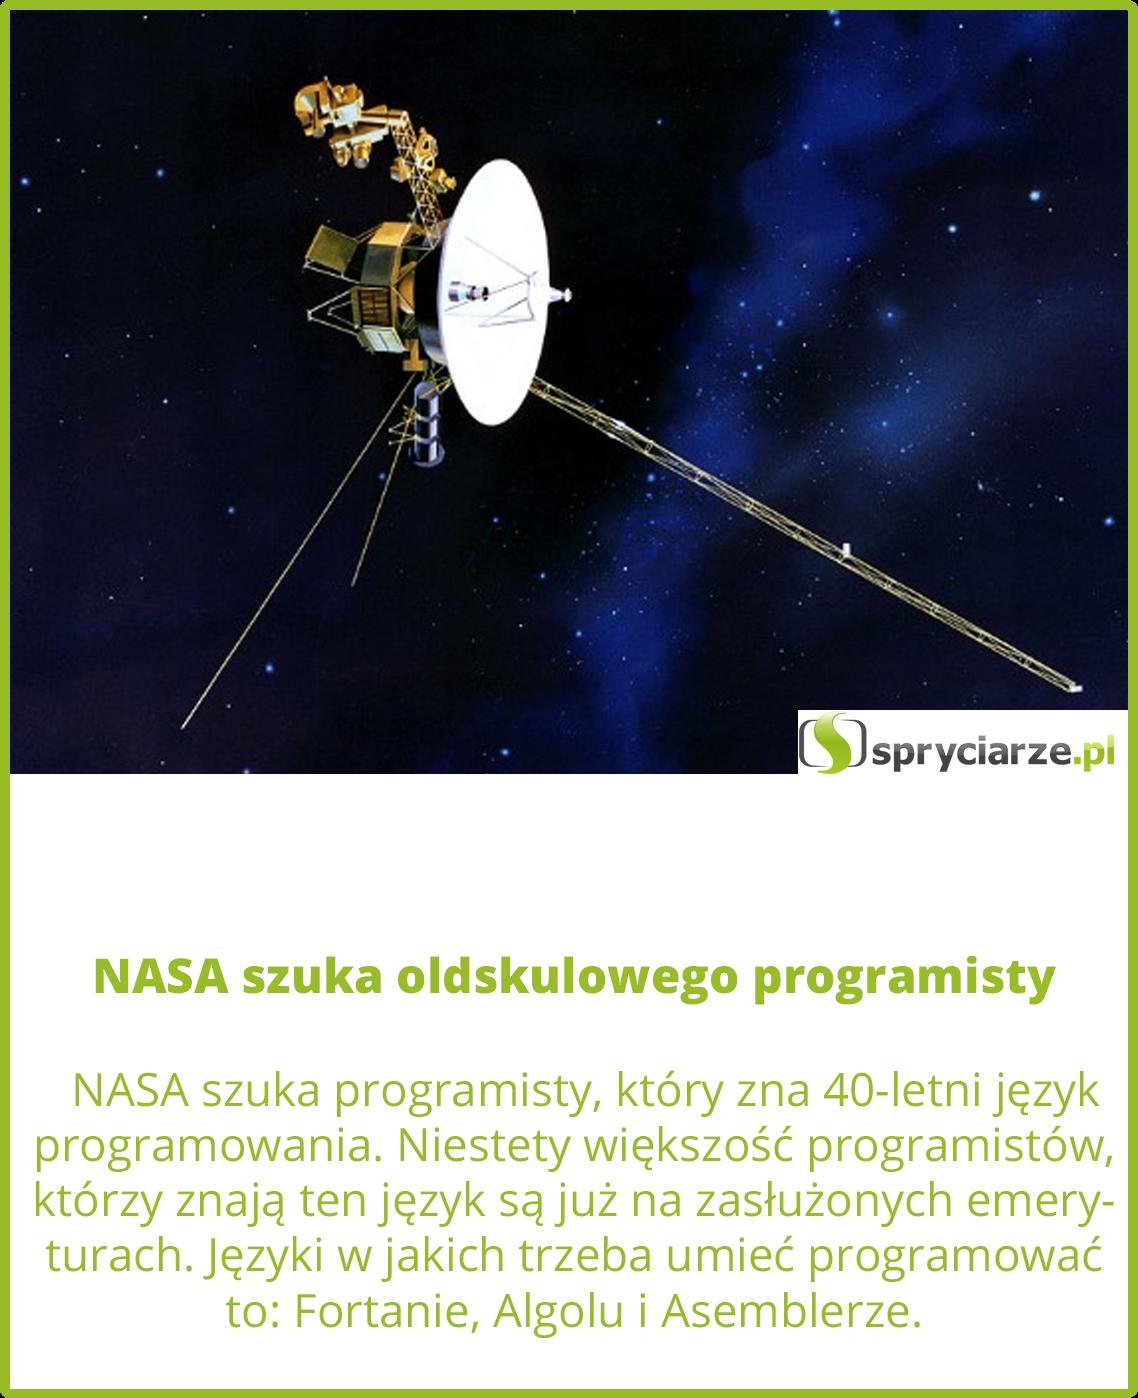 NASA szuka oldskulowego programisty